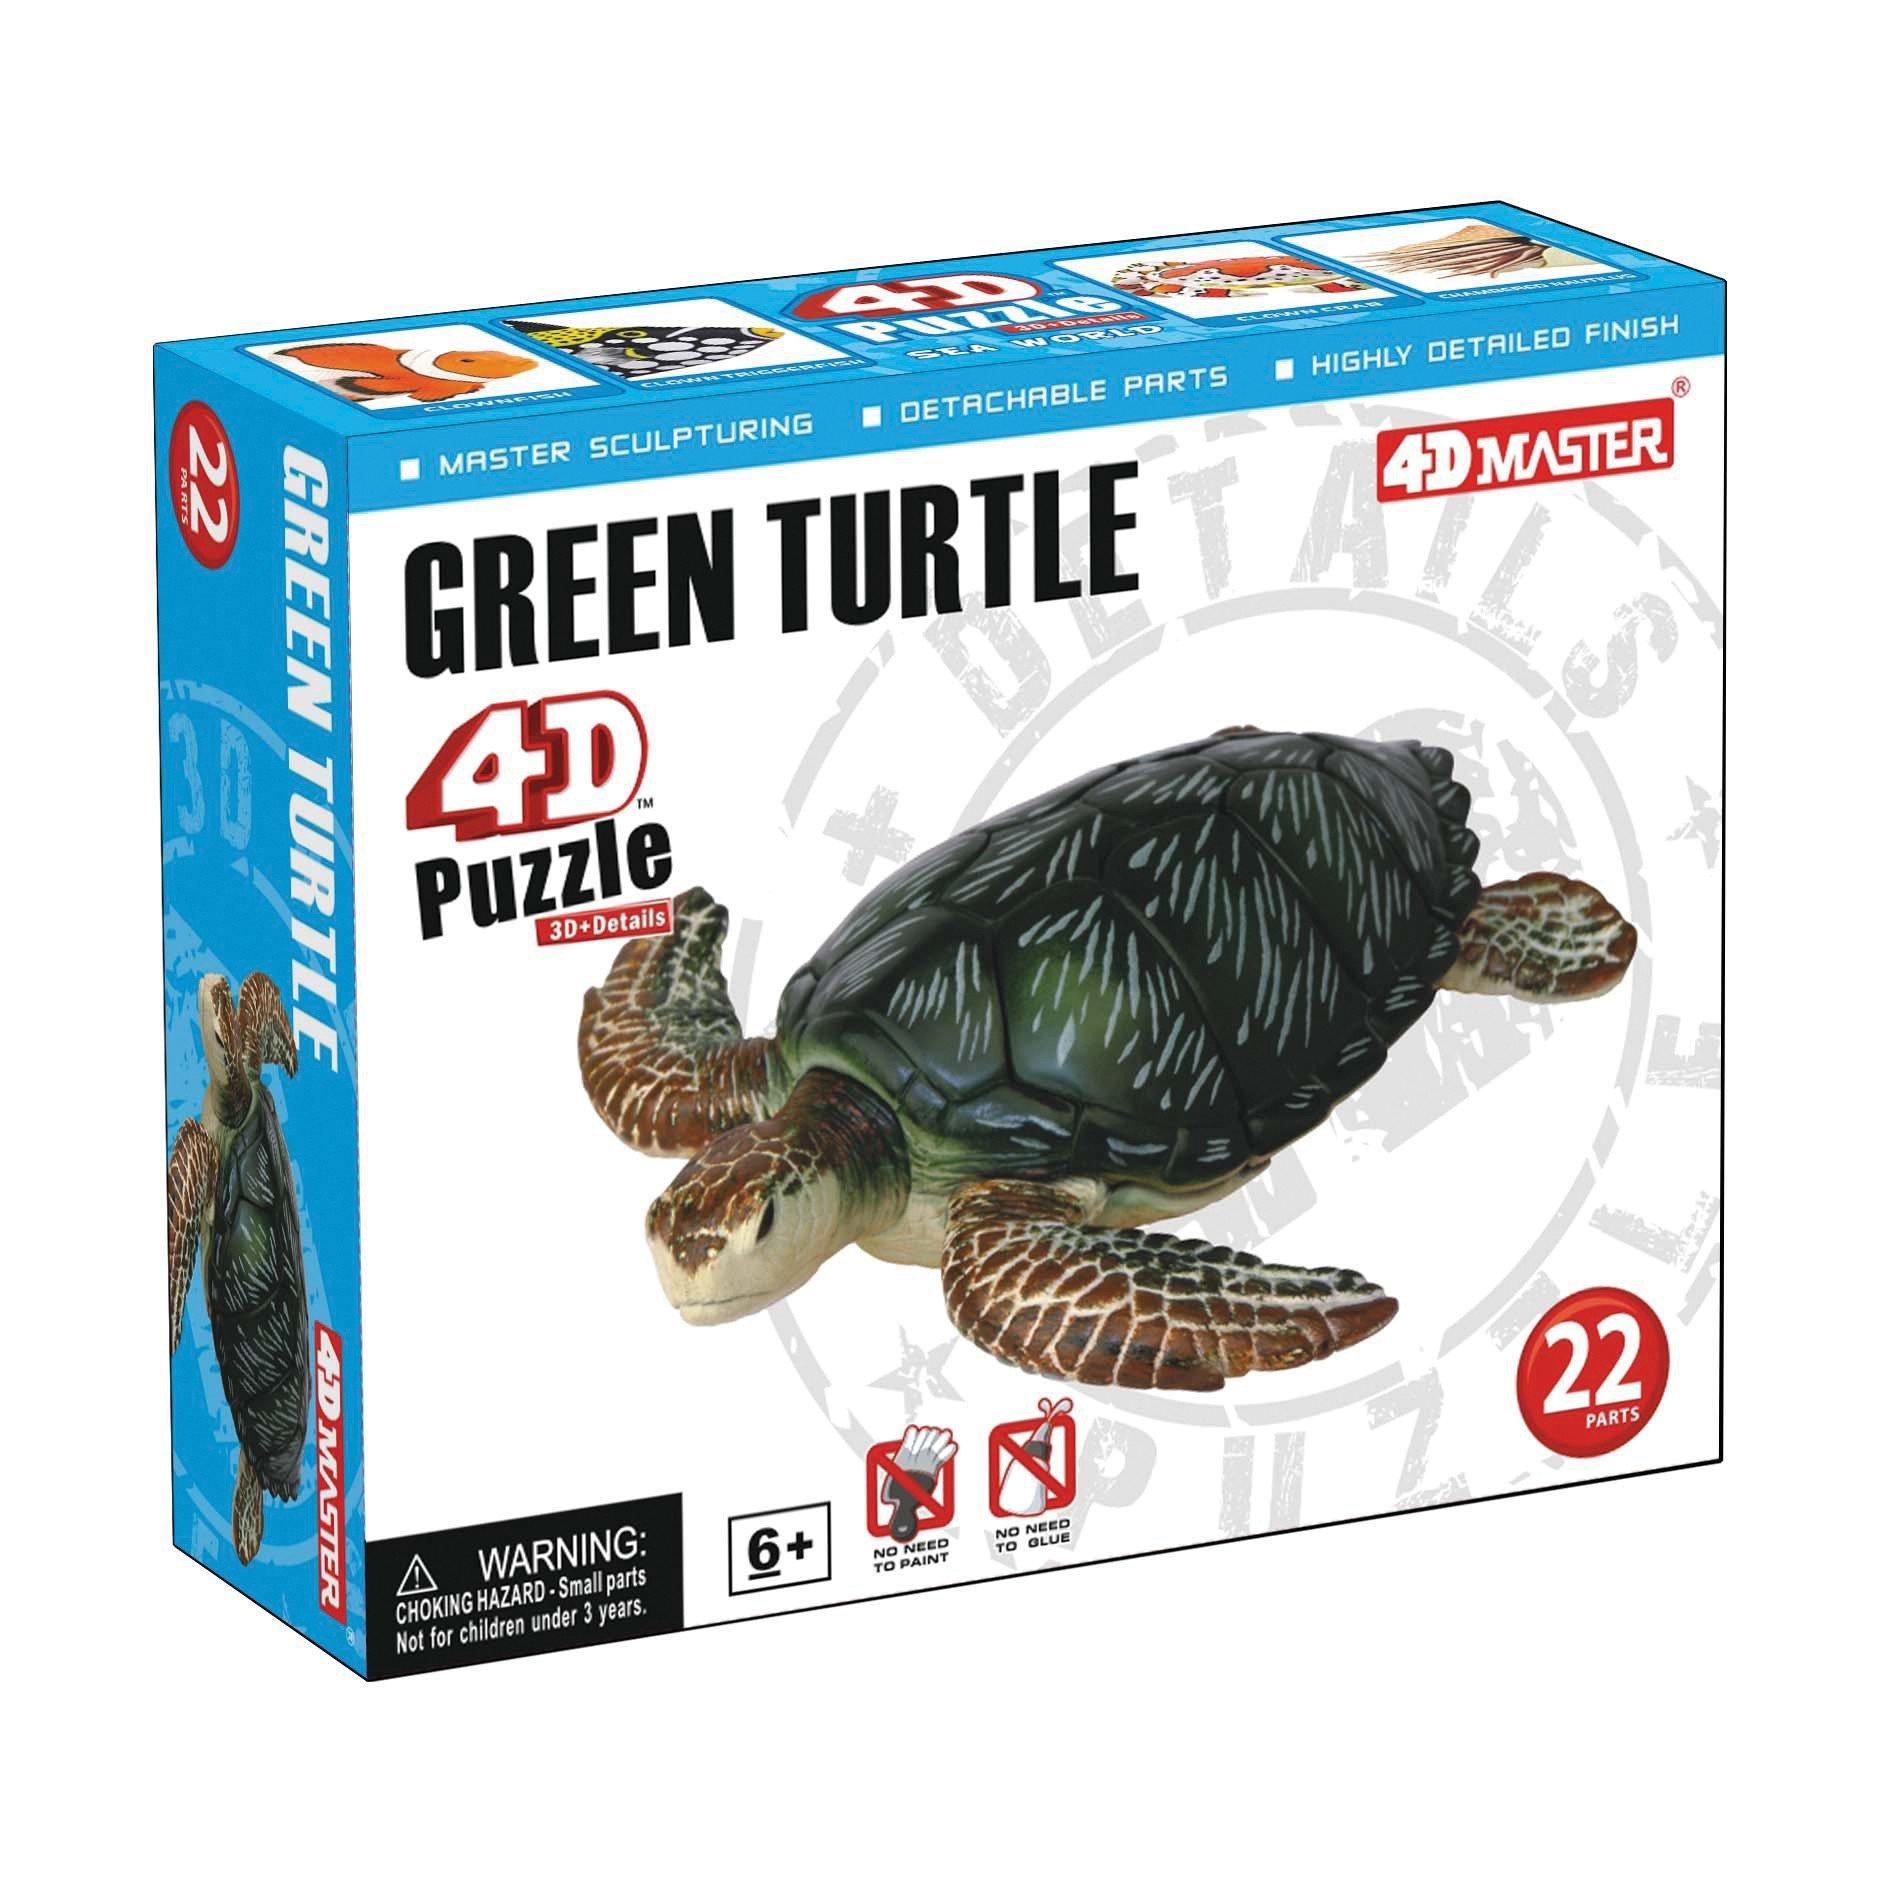 Constructive Playthings 26544 4D Puzzle - Green Turtle, Grade: Kindergarten to 5